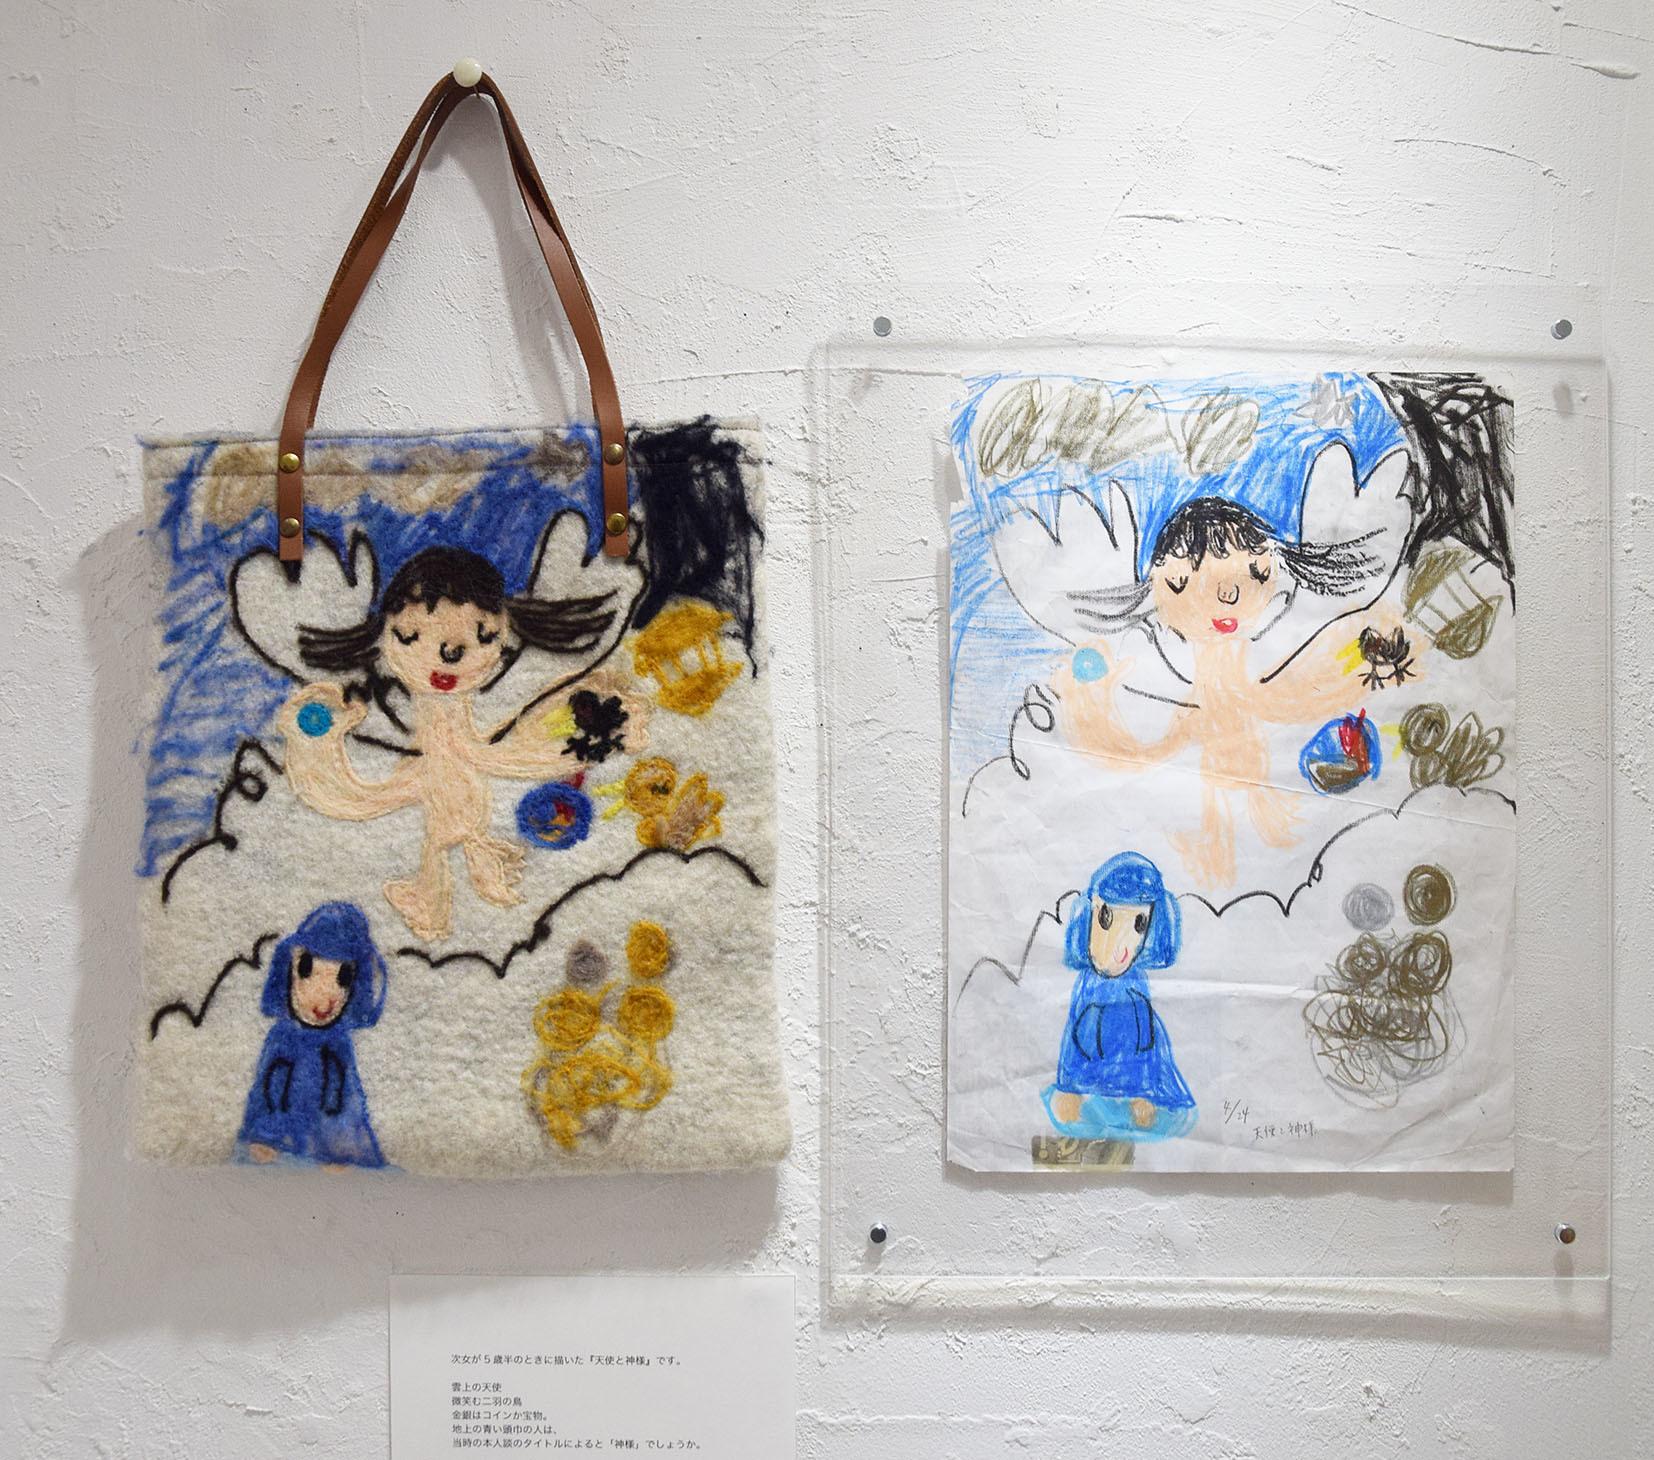 MOSAIC FELT Kokuga Rumi exhibition @ 3日目_e0272050_16514183.jpg